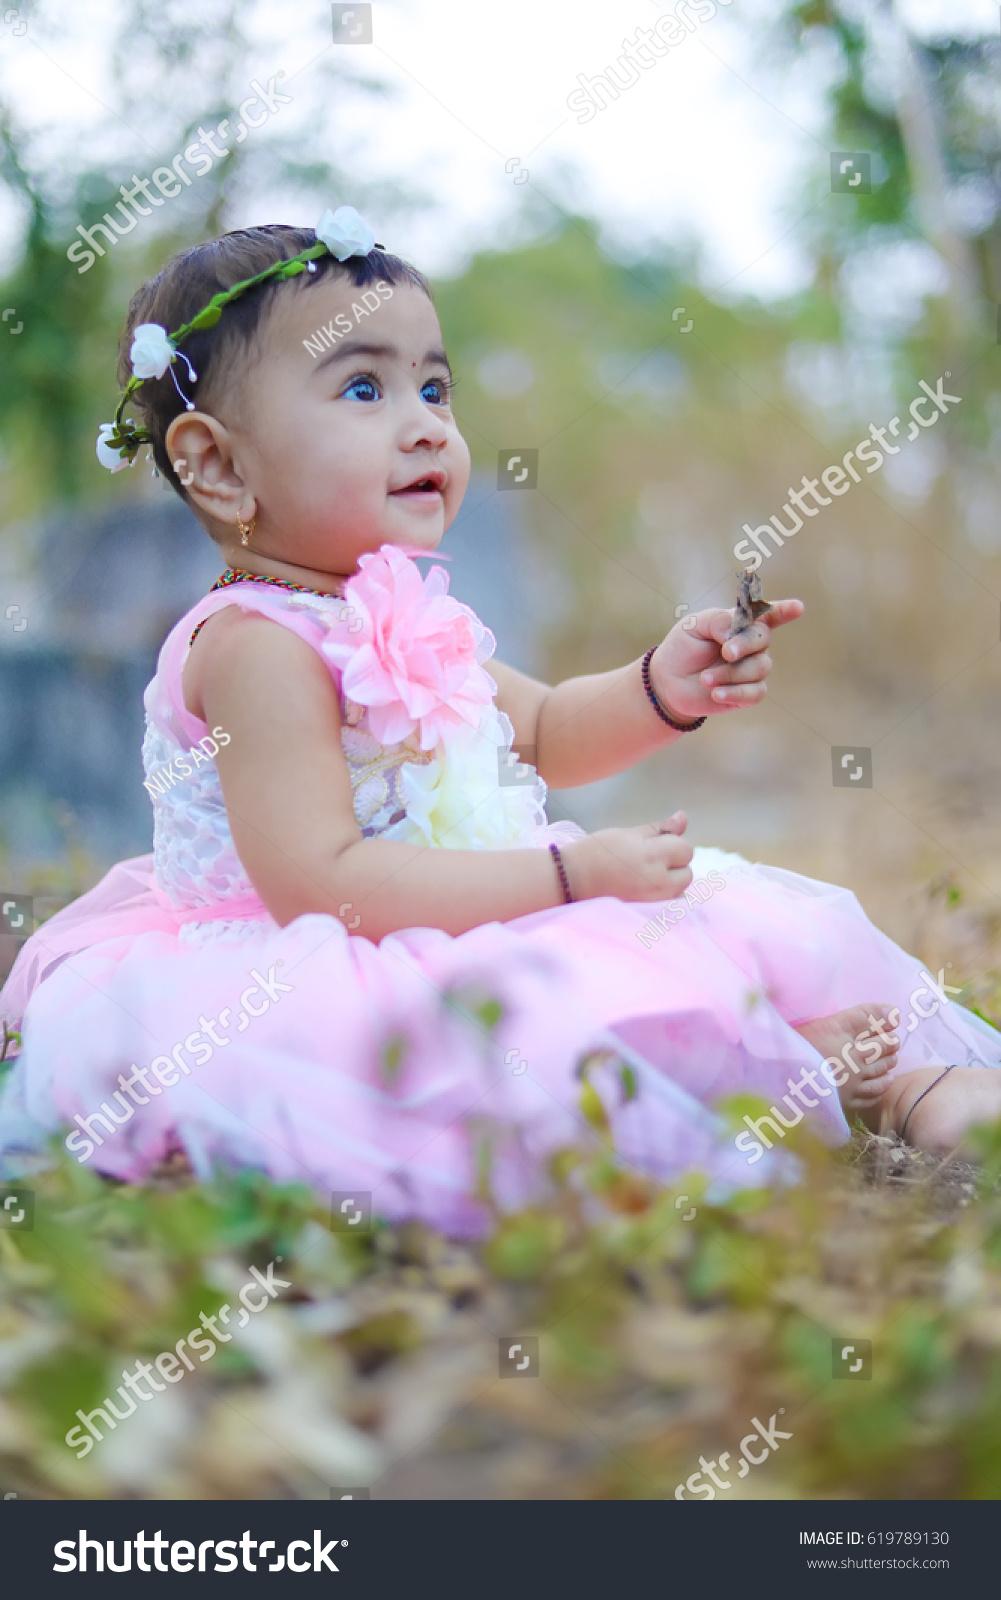 royalty-free cute indian baby girl #619789130 stock photo | avopix